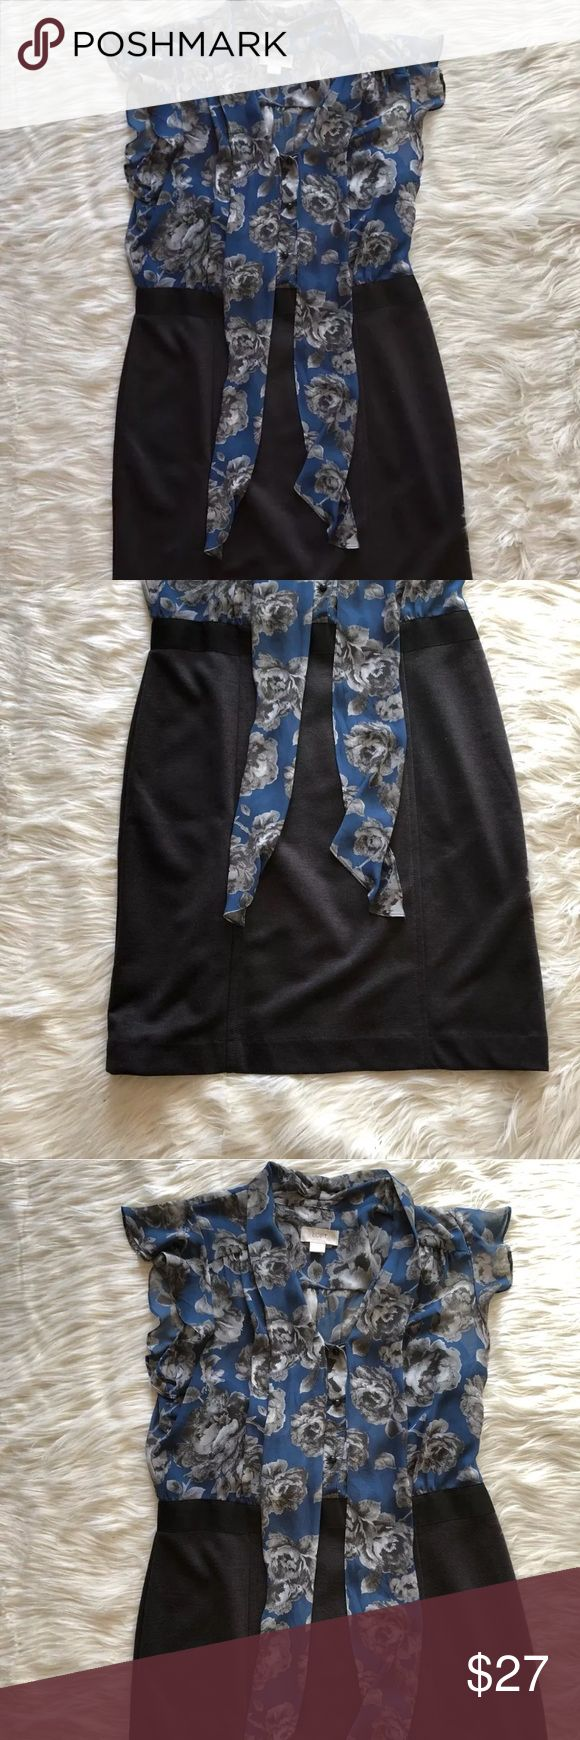 "Ann Taylor LOFT Career Dress Size 12 Floral Ruffle Ann Taylor career dress women's size 12. In great condition. Recently dry cleaned.   Approx measurements  Armpit to armpit 22"" Shoulder to hem 37"" LOFT Dresses Midi"